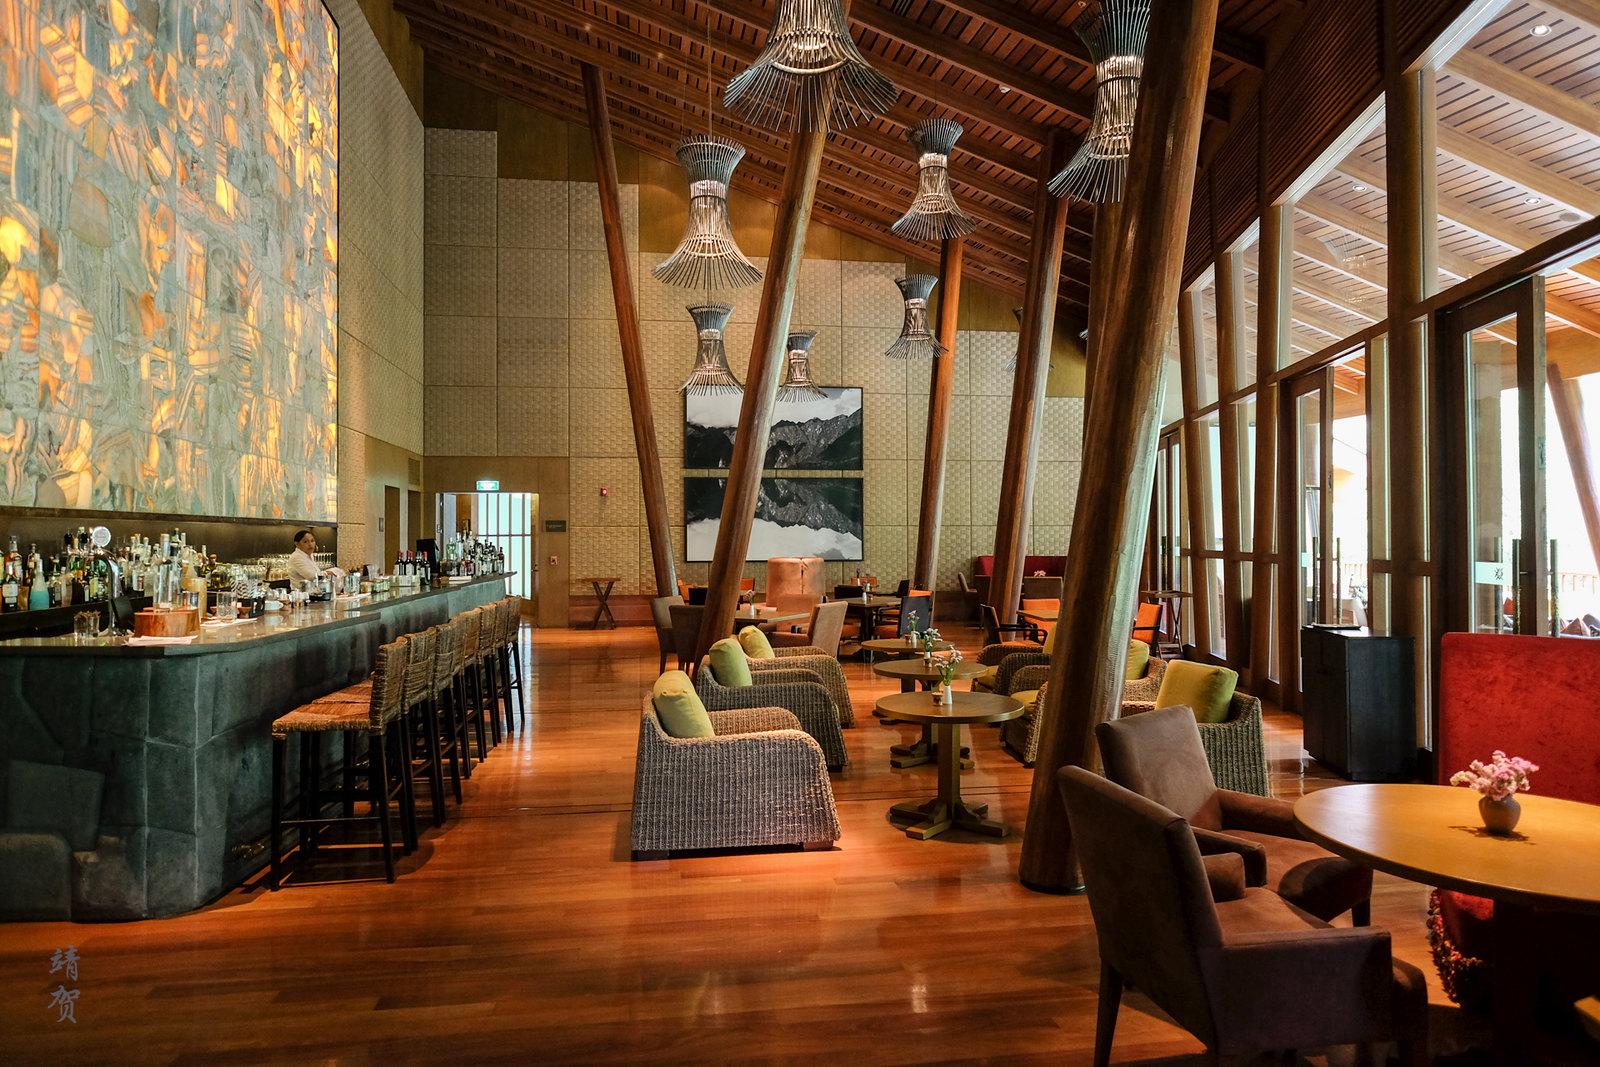 Inside Kiri bar